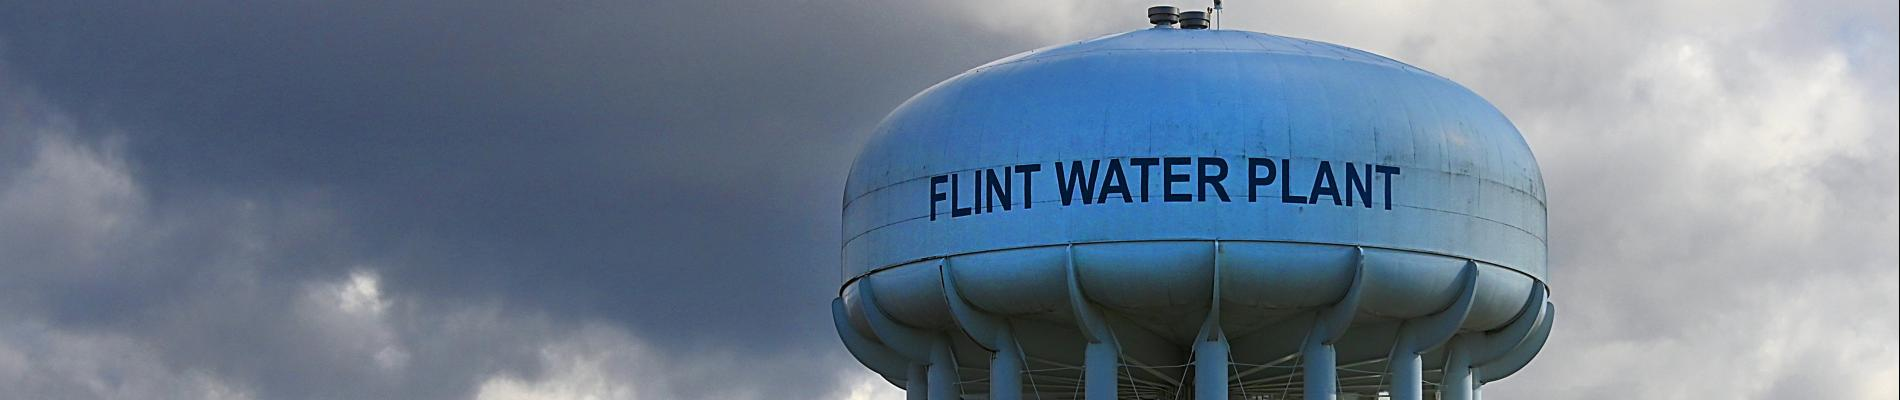 The Flint Water Crisis with Dr. Mona Hanna-Attisha